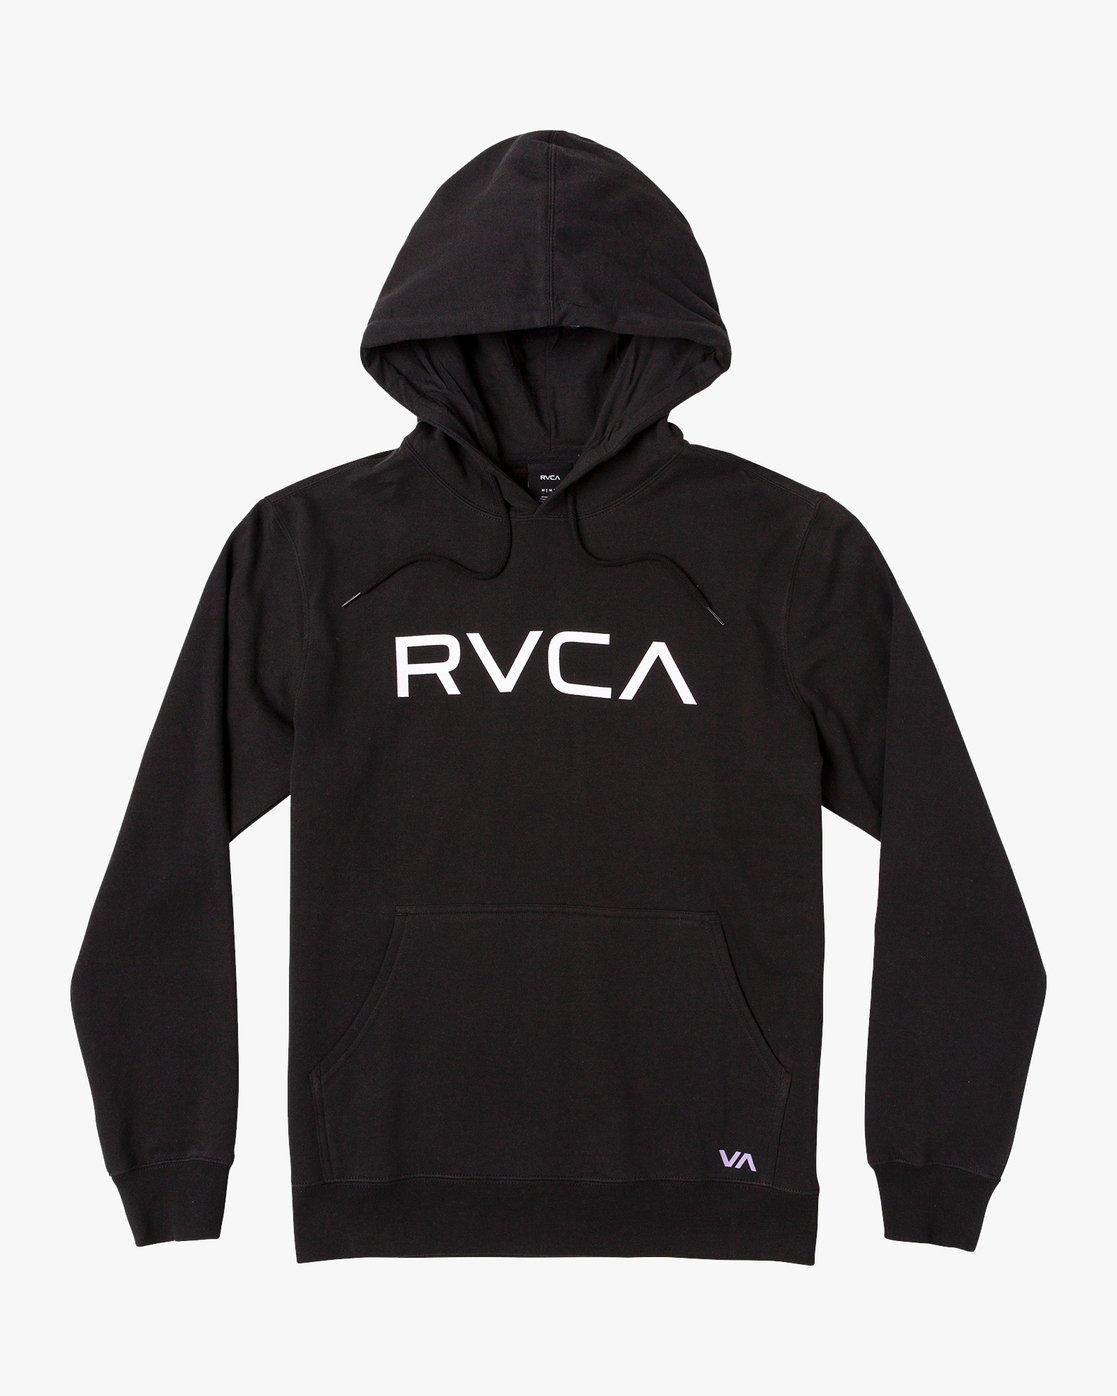 RVCA Big RVCA Hoodie - Black